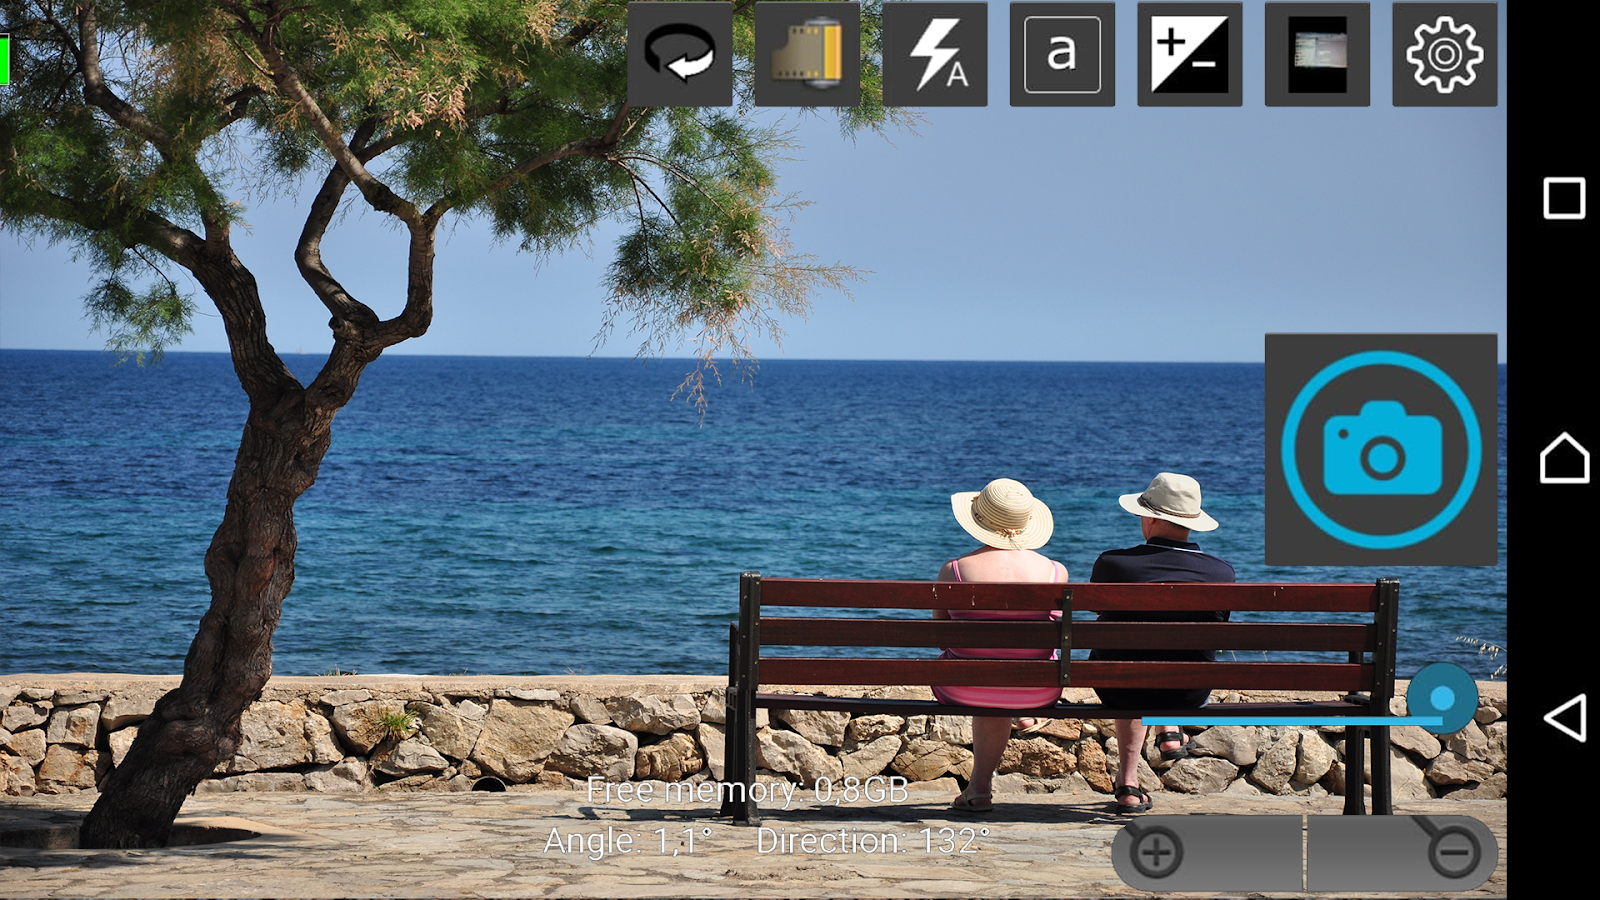 Camera Huawei Style Huawei Mate 10 P20 LEICA Pro 4 2 APK